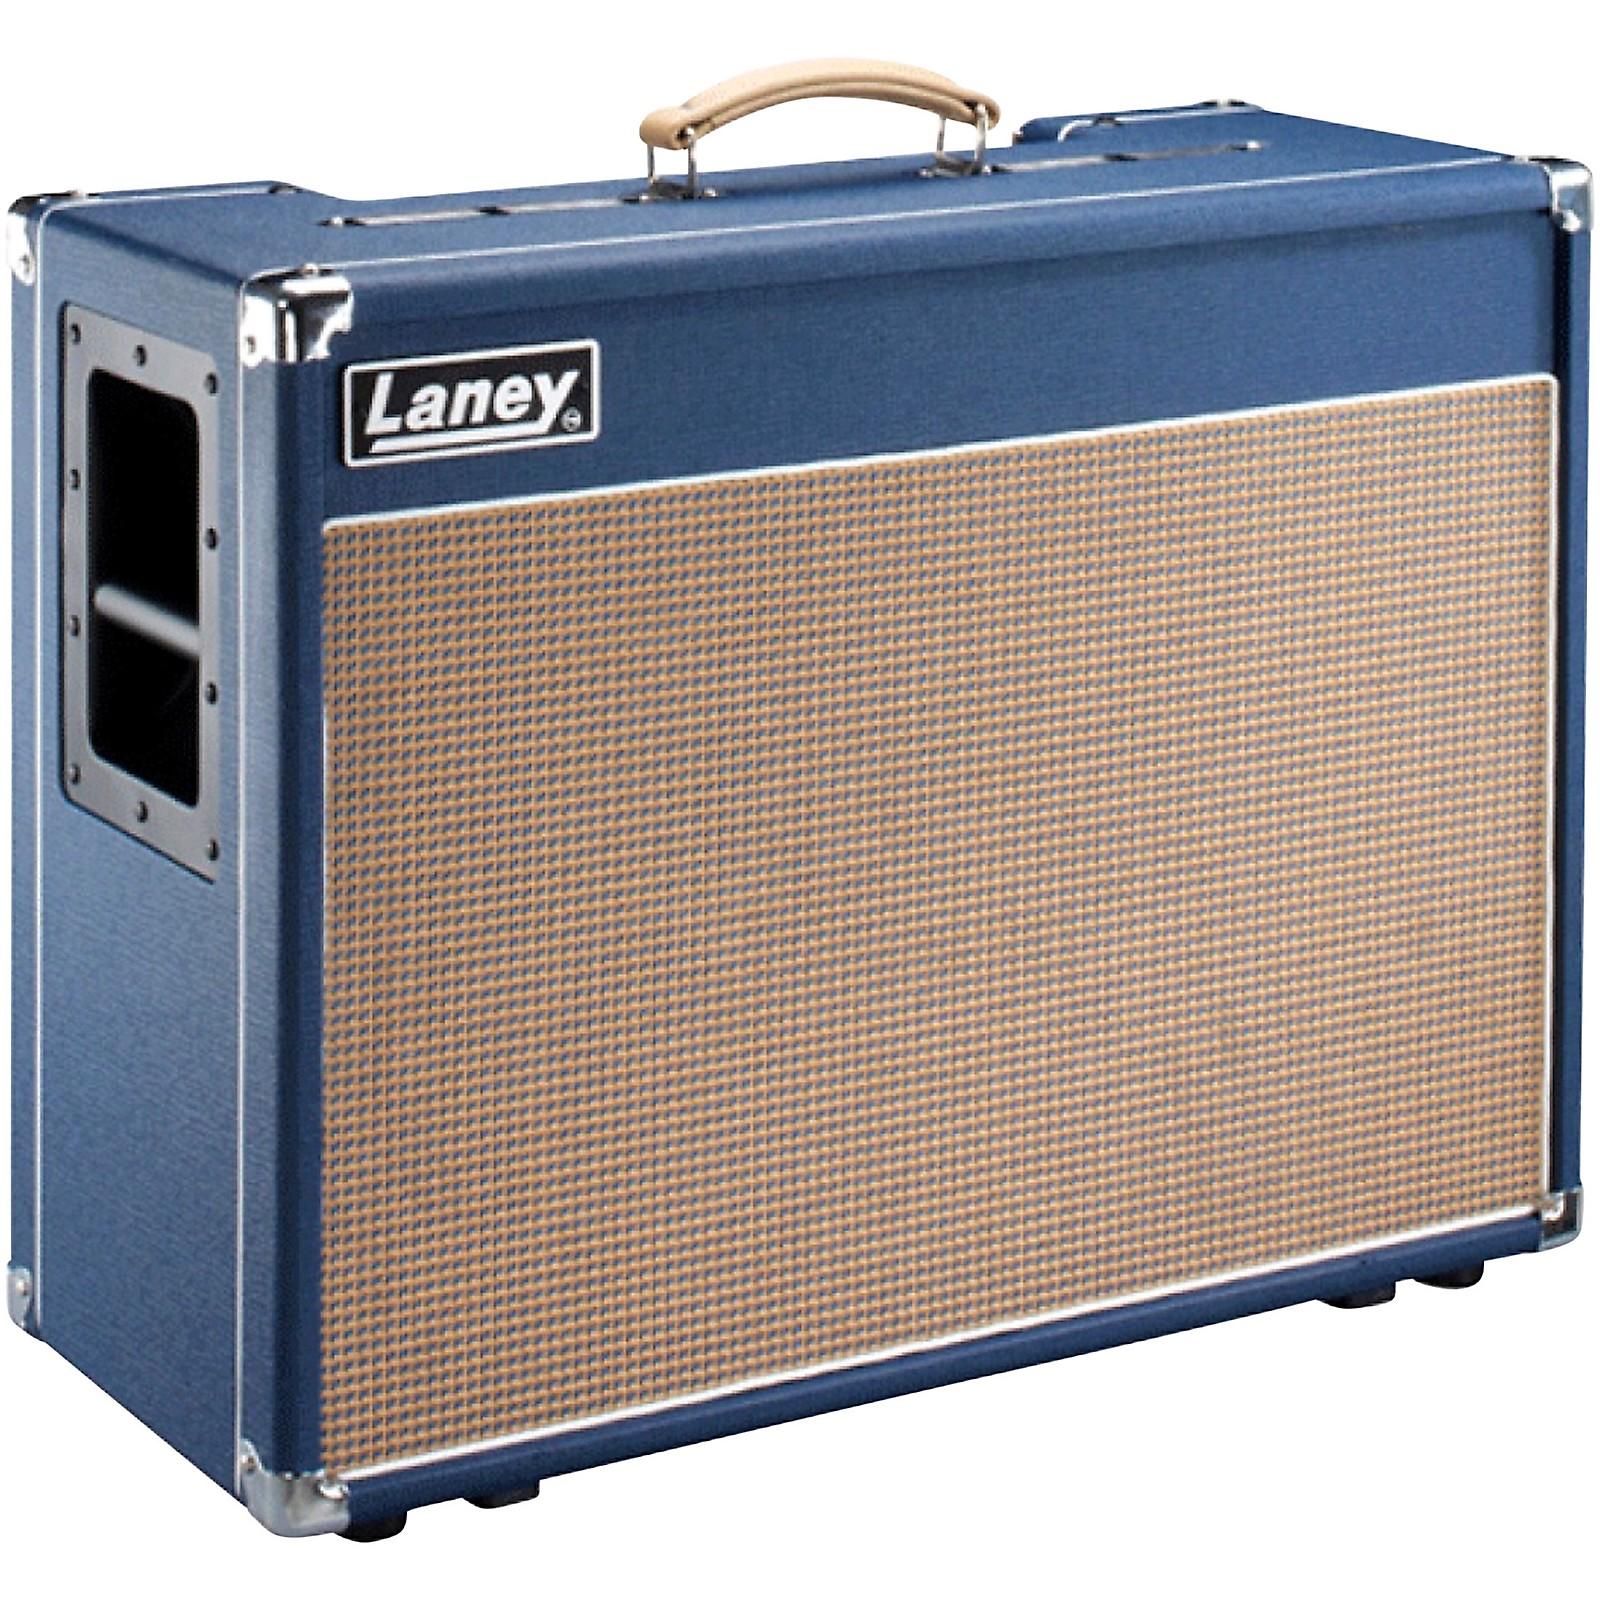 Laney Lionheart L20T-212 20W 2x12 Tube Guitar Combo Amp